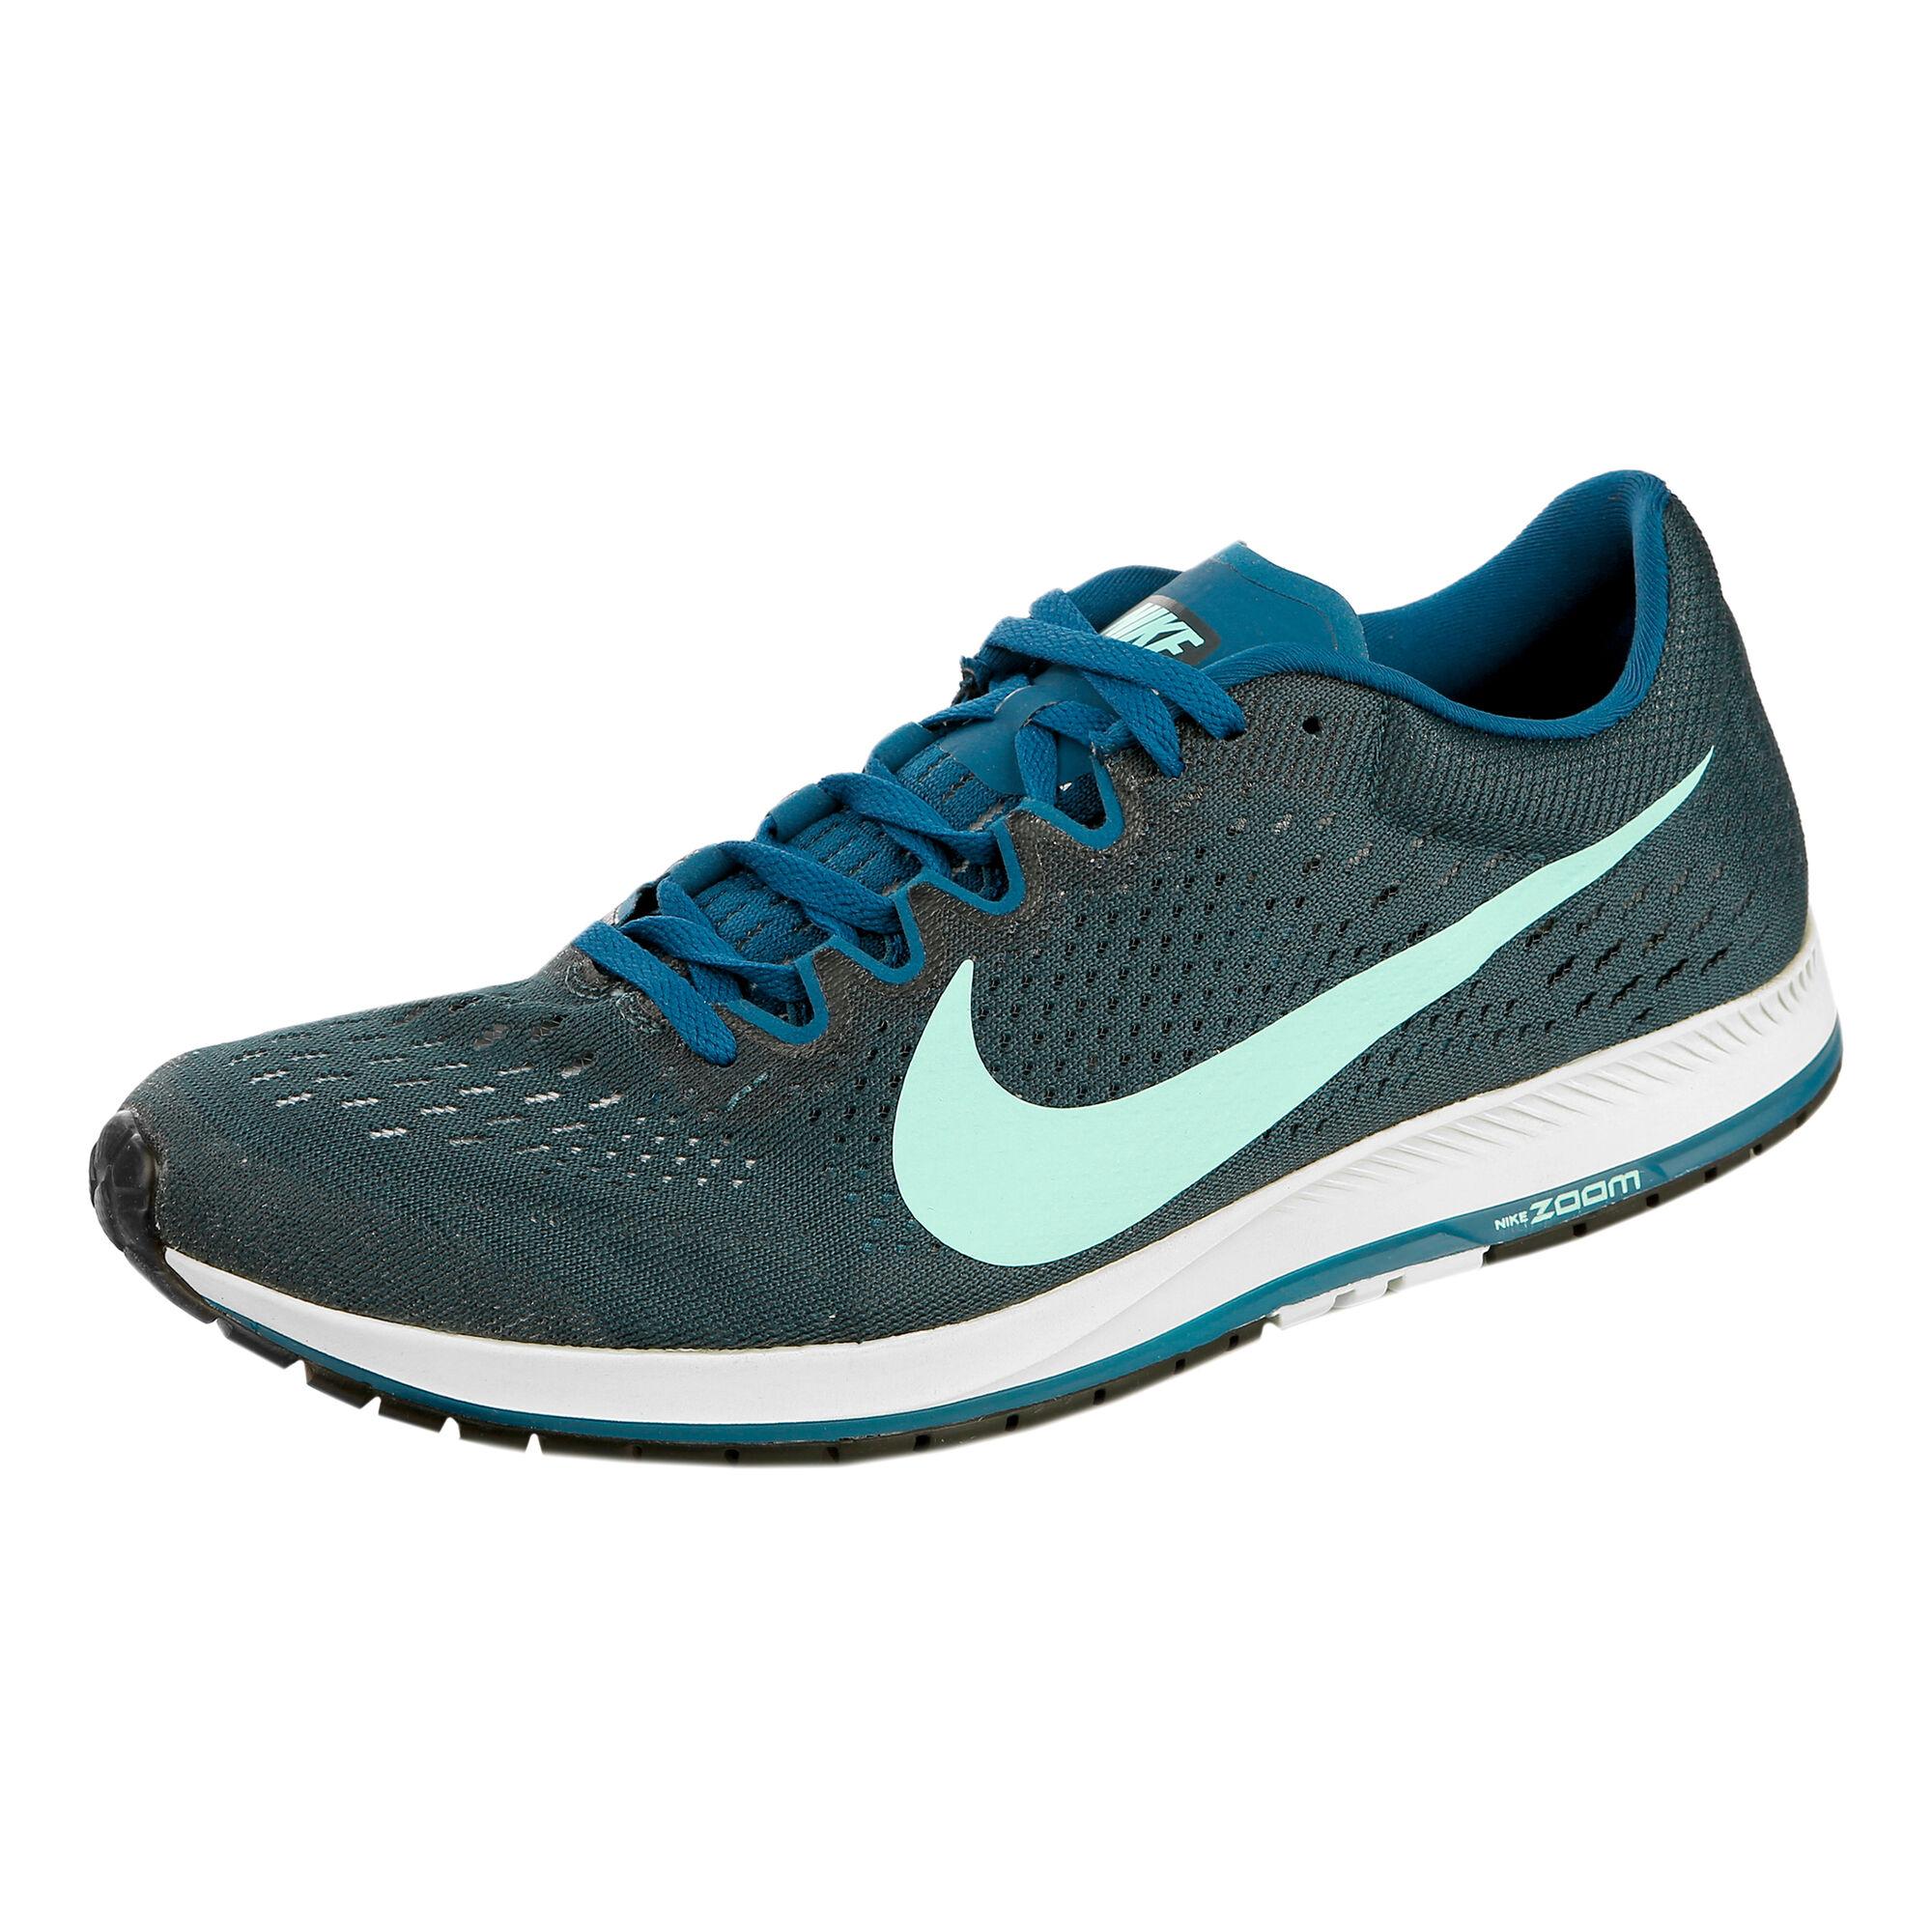 a05edb0e79d buy Nike Air Zoom Streak 6 Neutral Running Shoe Men - Petrol